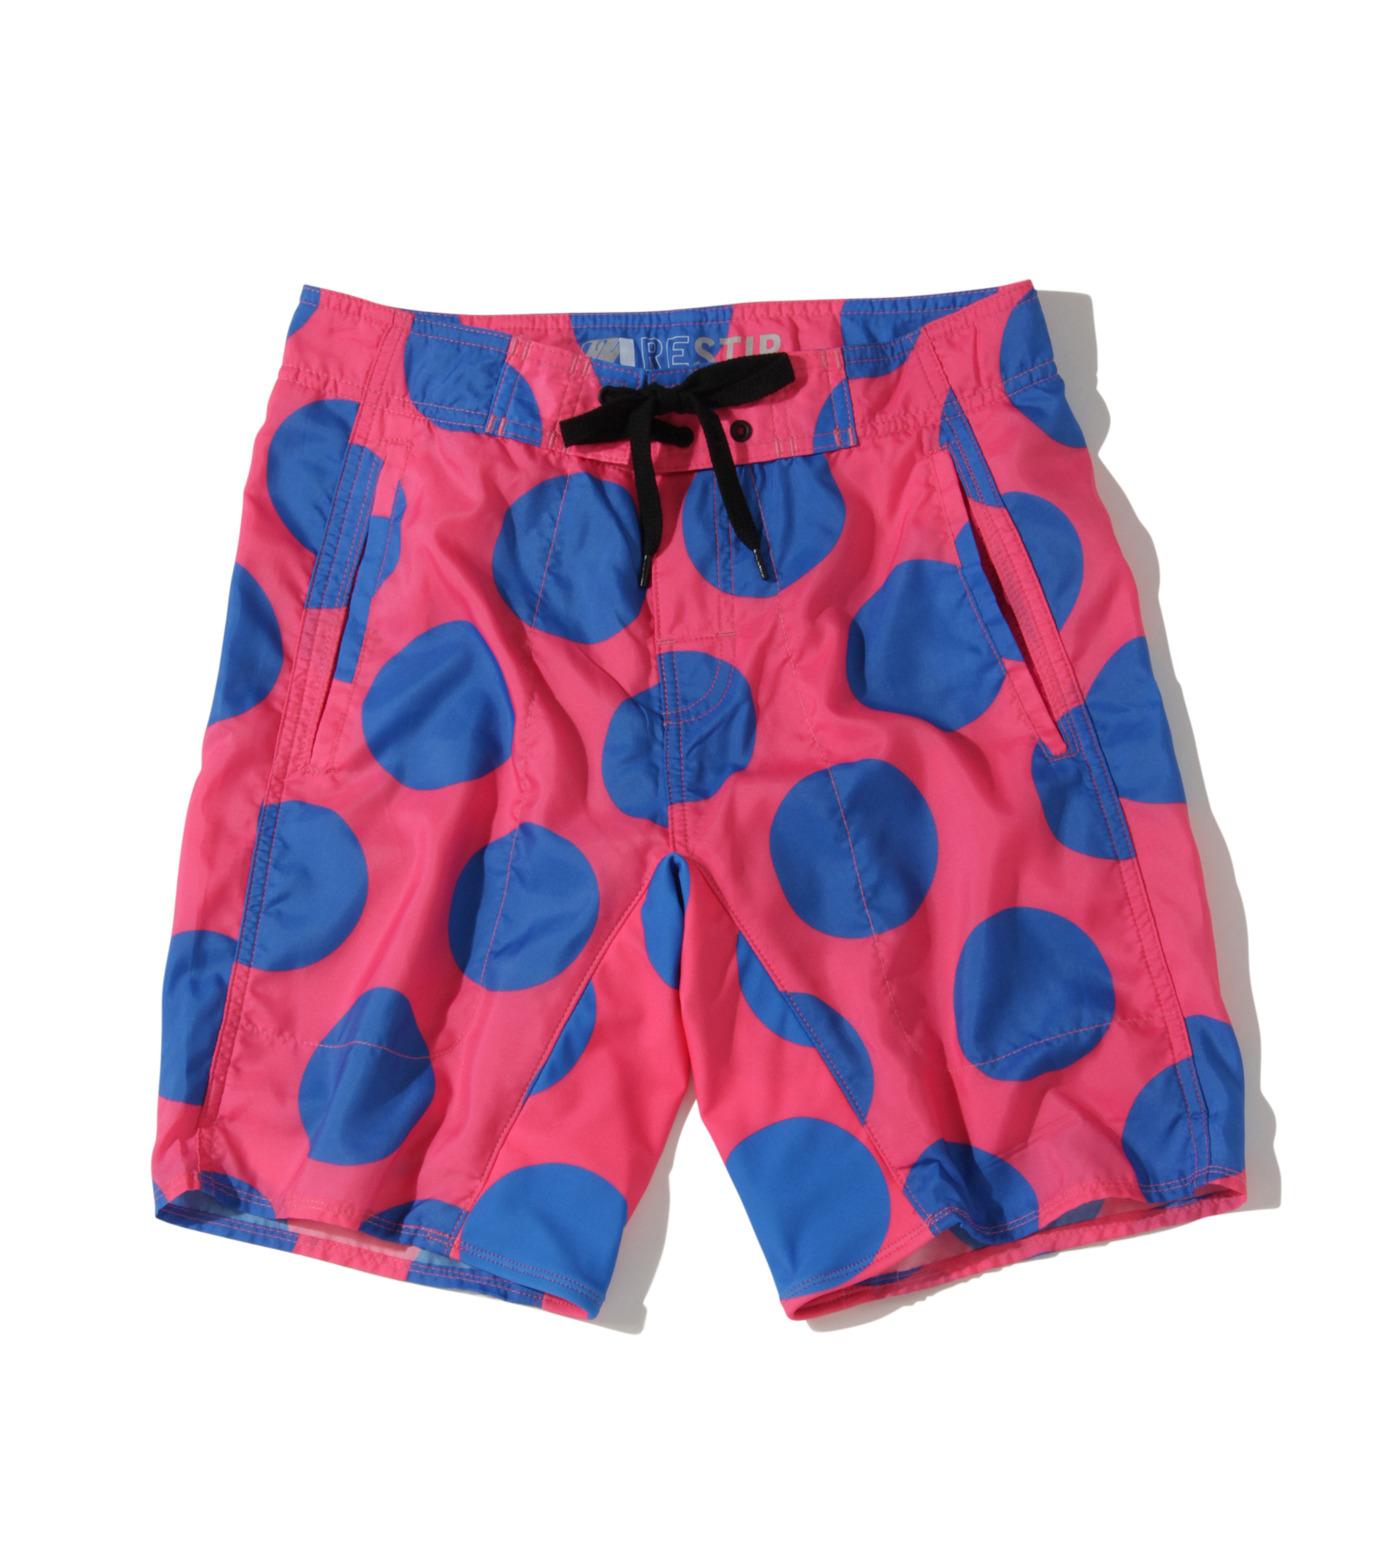 TWO TWO ONE(トゥートゥーワン)のDot surf shorts-SALMON PINK(SWIMWEAR/SWIMWEAR)-15N98003-73 拡大詳細画像1